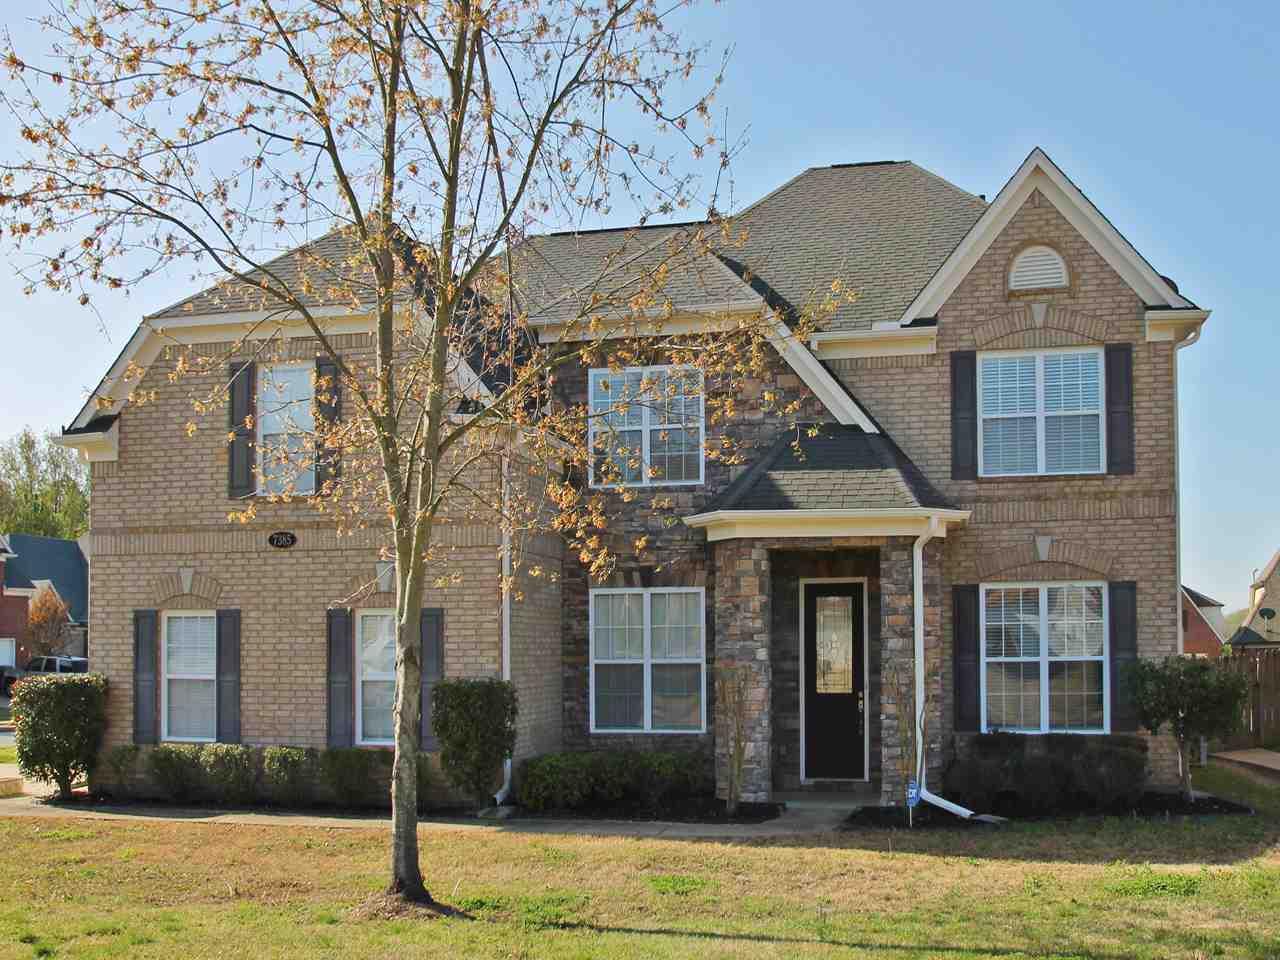 7385 Cotton Grove Memphis, TN 38119 - MLS #: 10023674